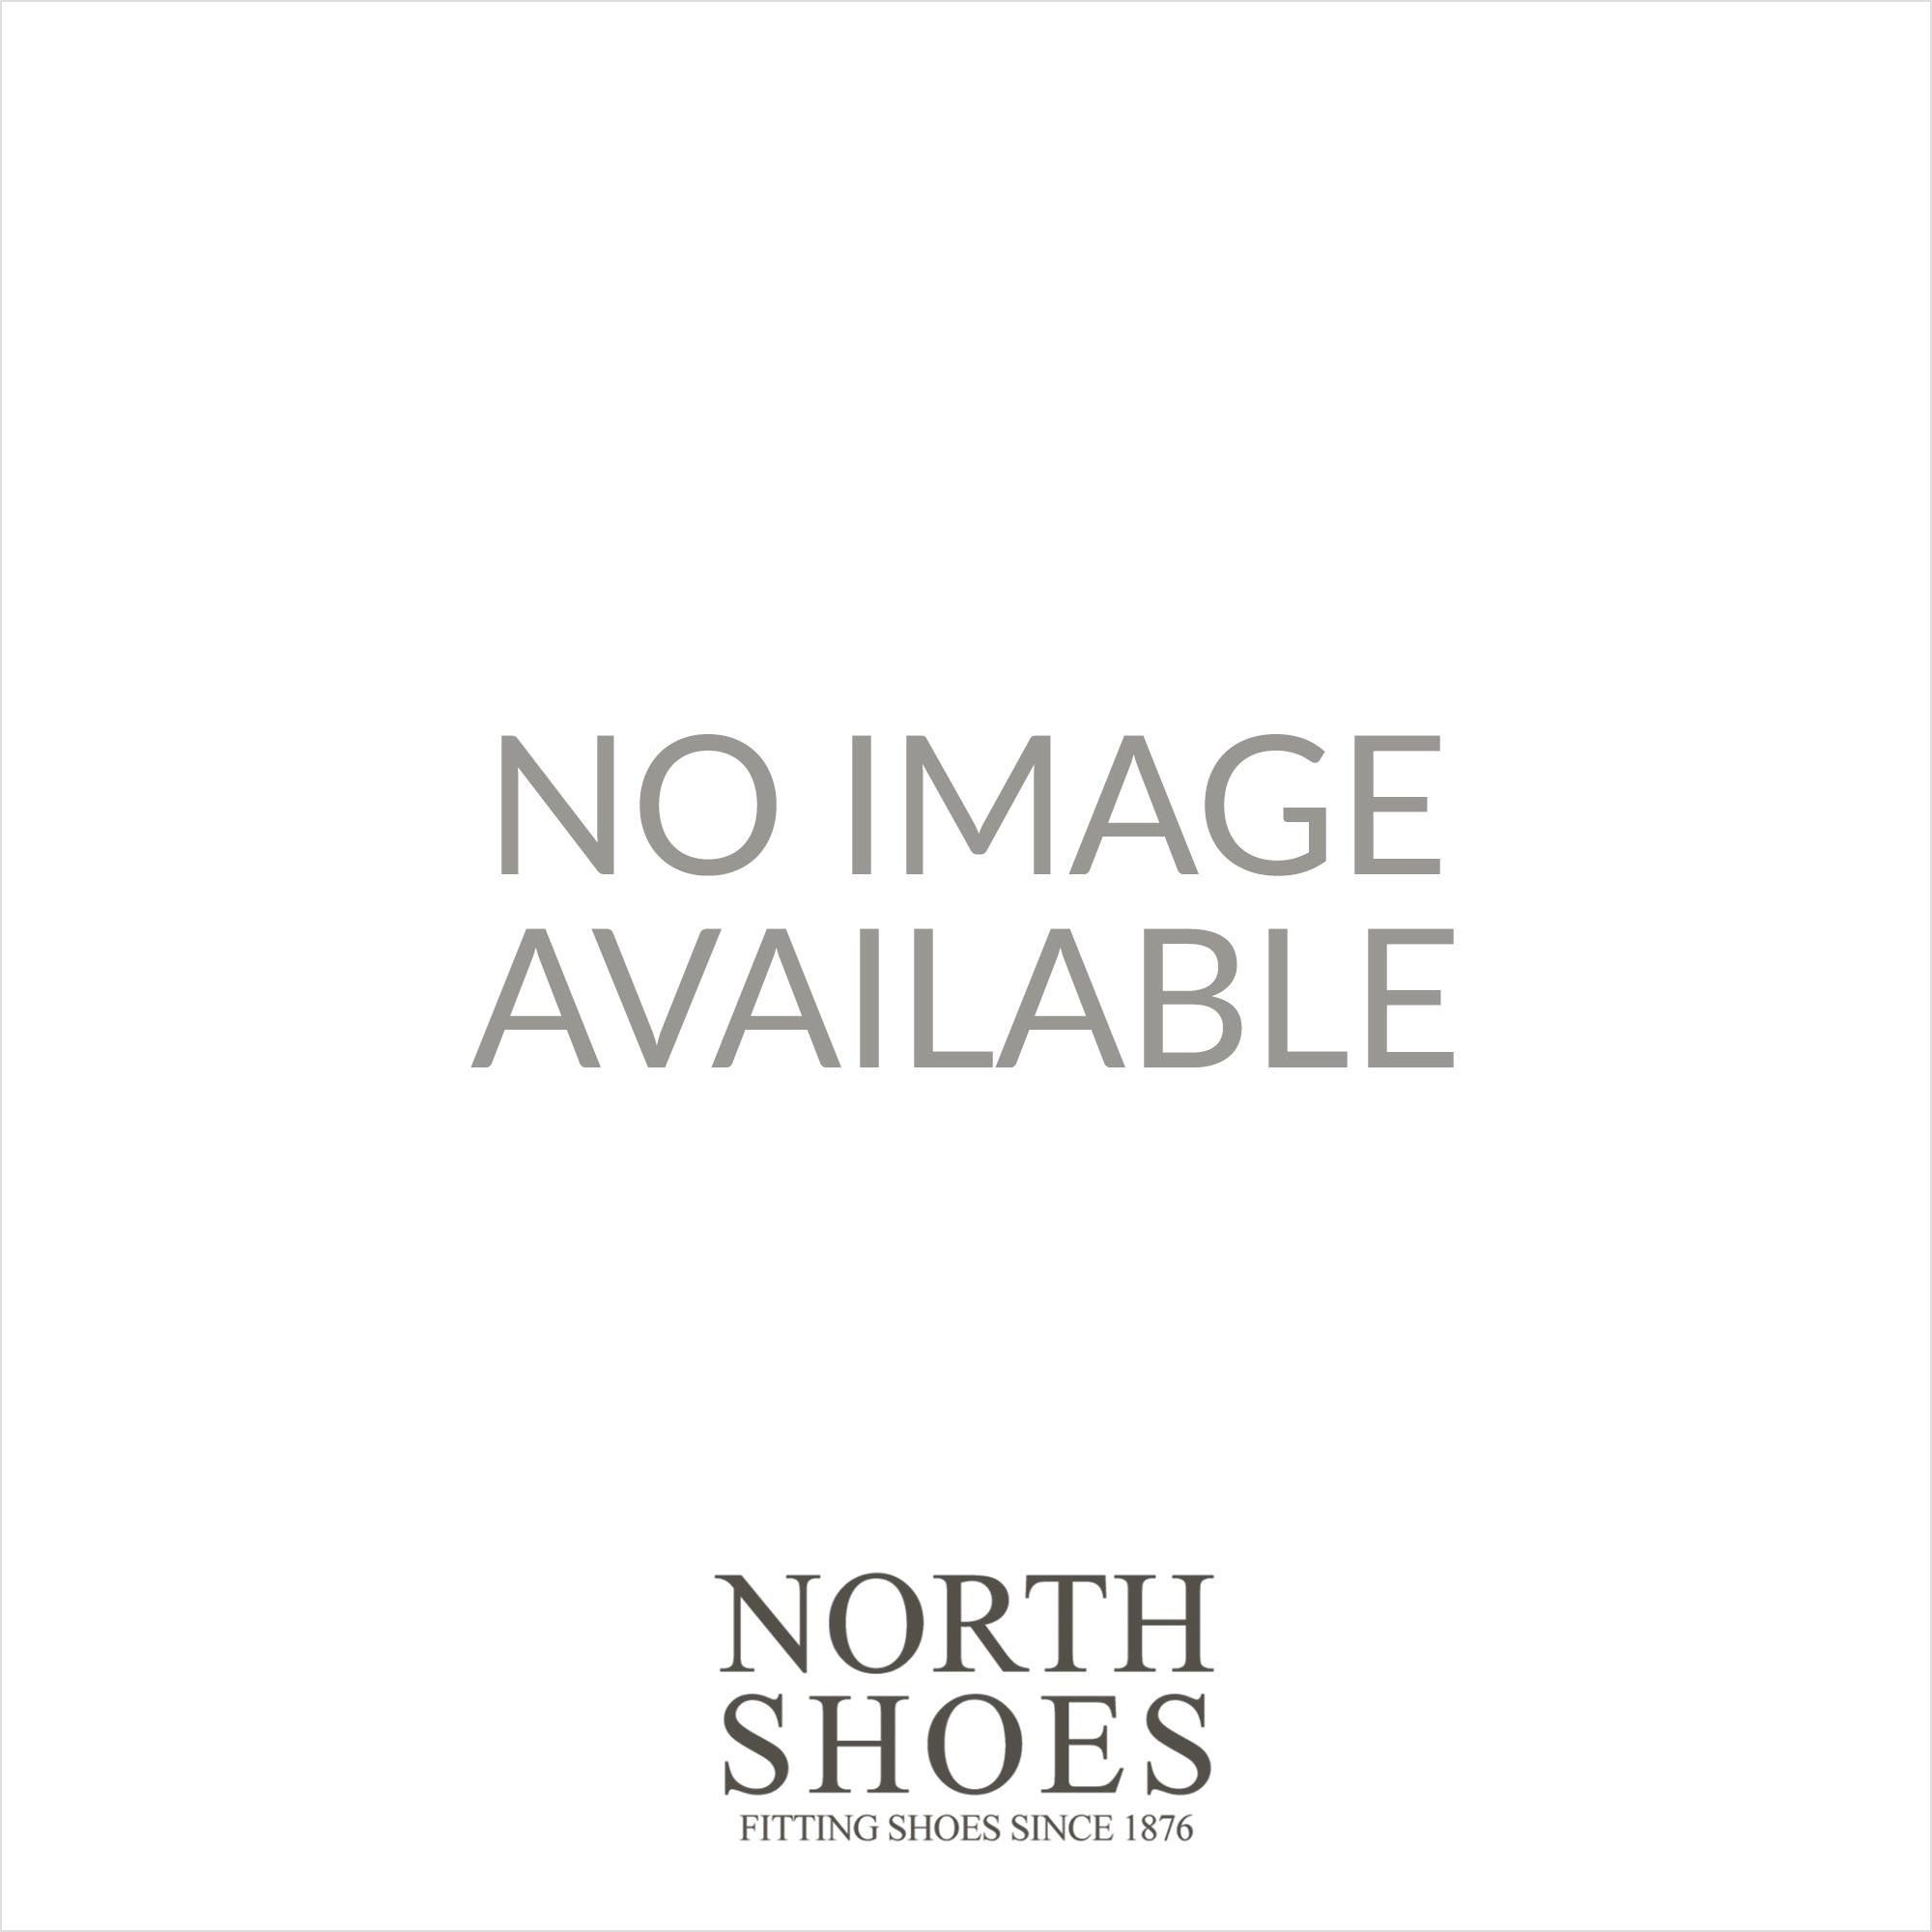 d0a60b683ebd ... Converse Chuck Taylor All Star Ox 66045C Rose Gold Glitter Girls Lace  Up Shoe